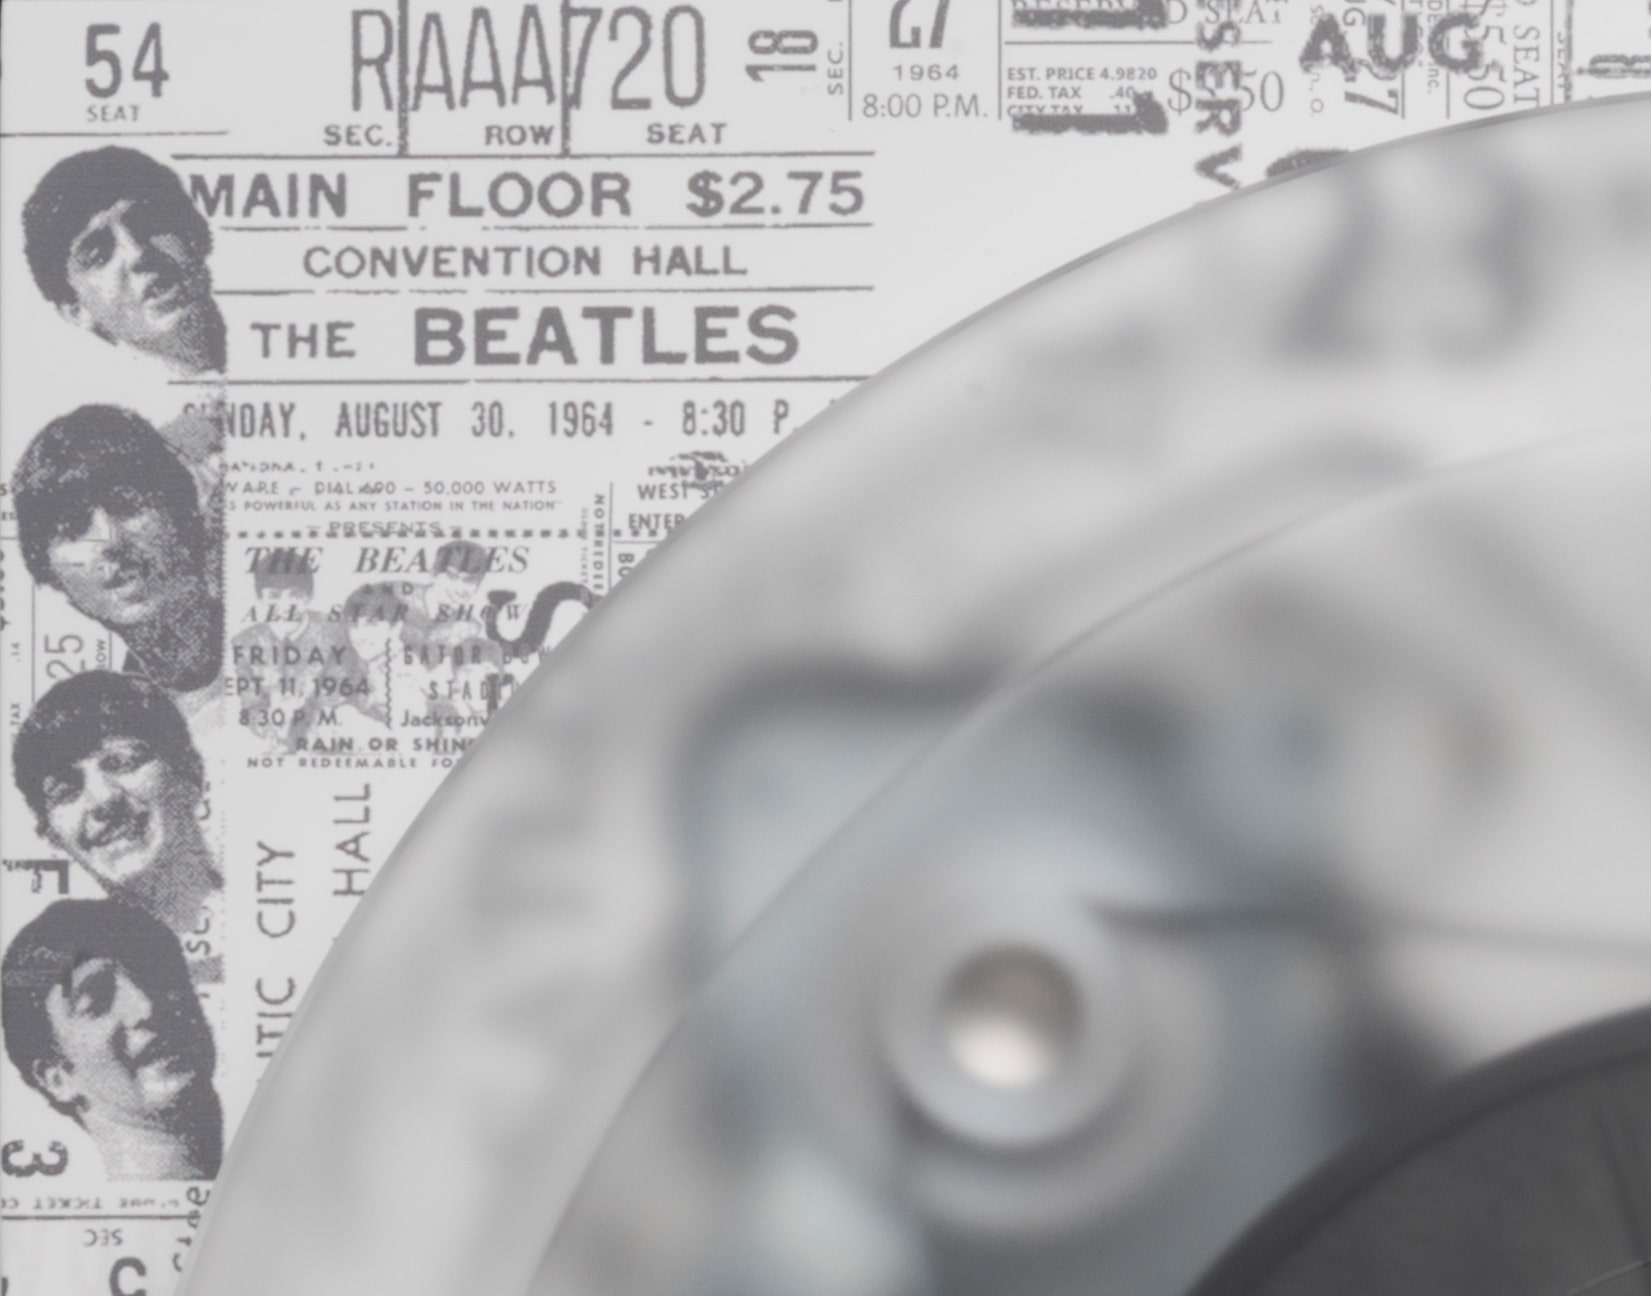 PJ-Debut-Carbon-Esprit-SB-The-Beatles-1964-Recordplayer-Detail-Acryl-Pulley-Print-hires